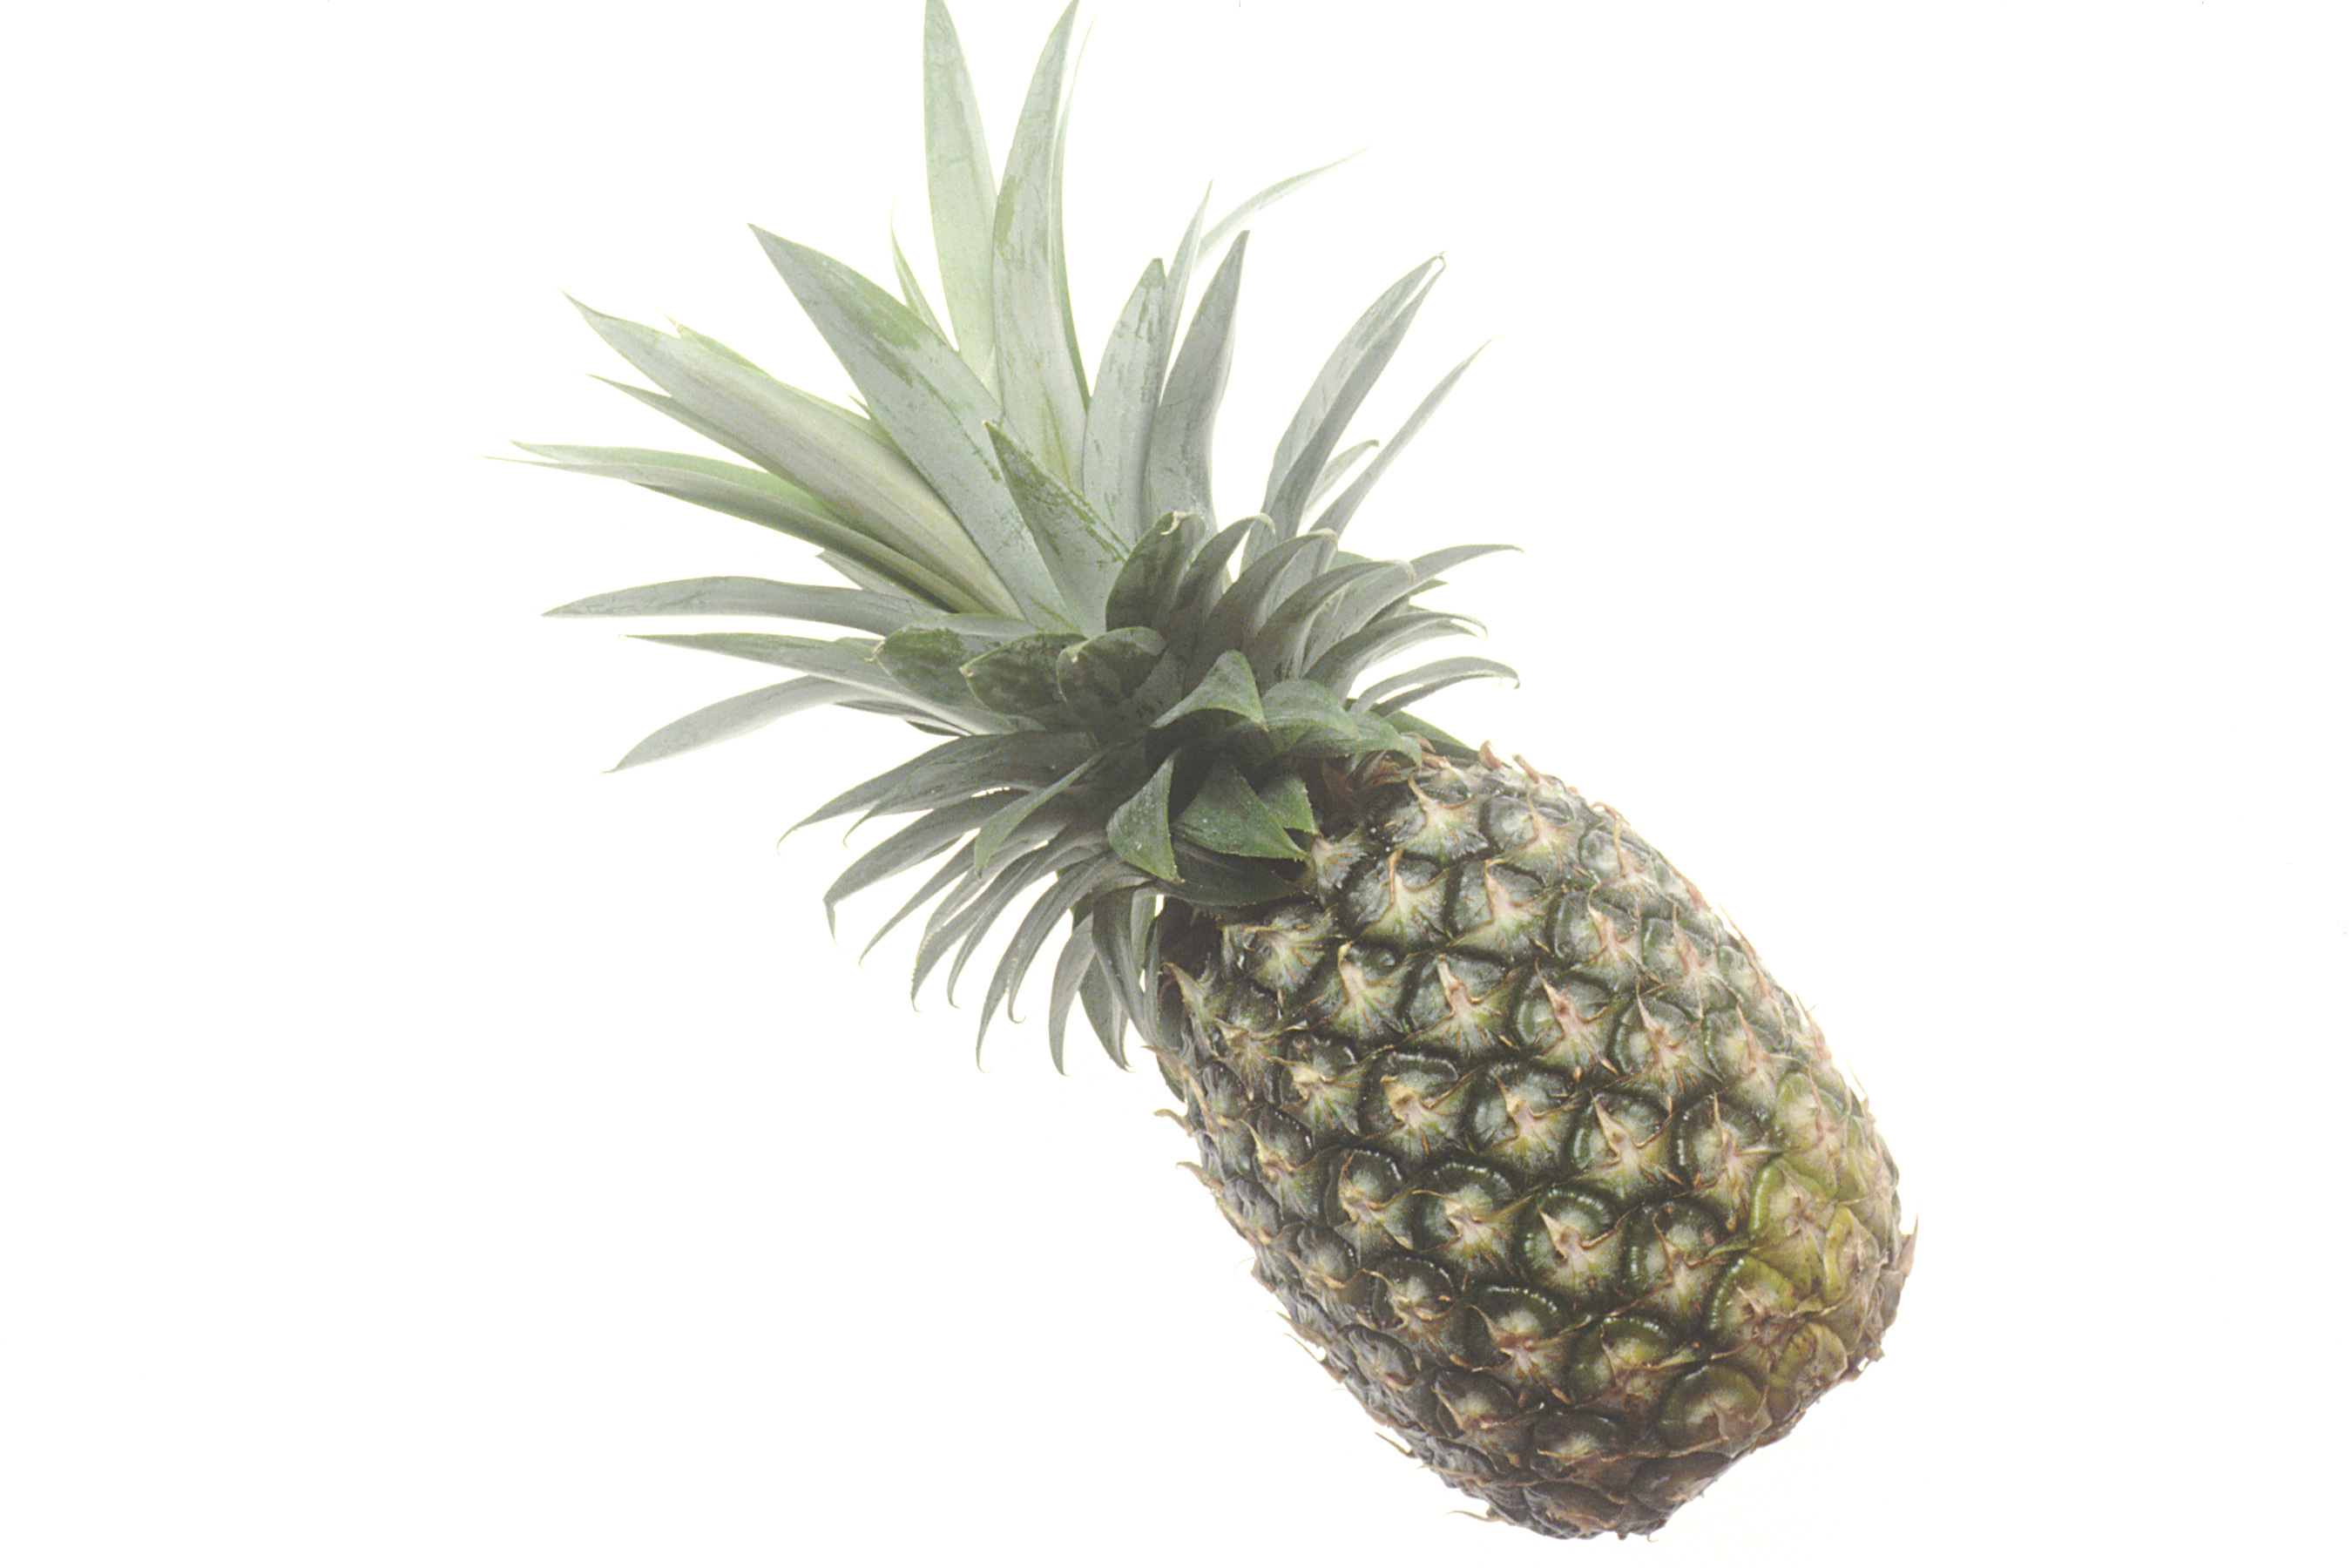 Http Commons Wikimedia Org Wiki File Pineapple Jpg